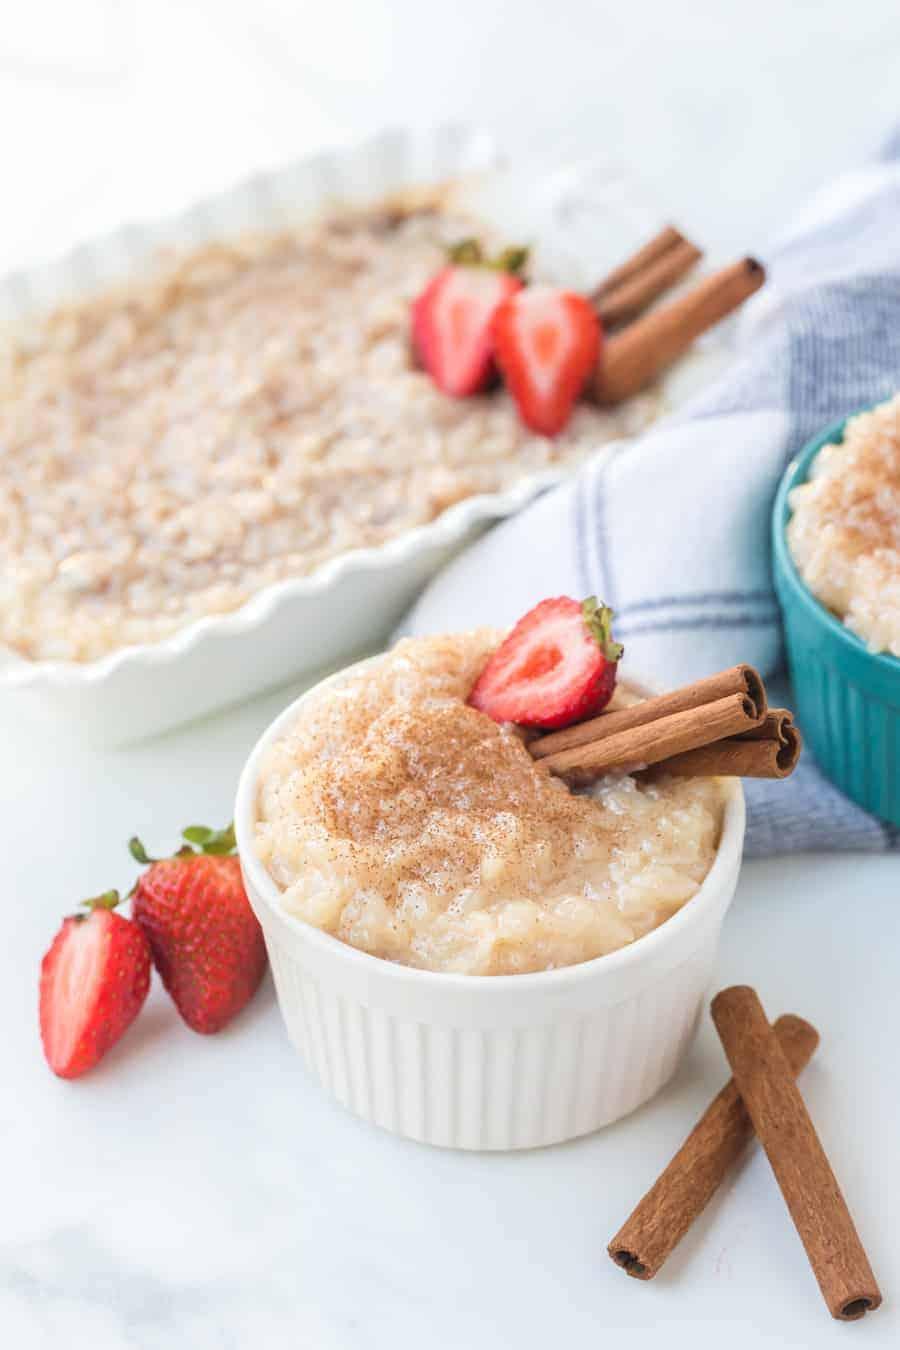 Rice pudding with strawberries and cinnamon sticks in ramekins